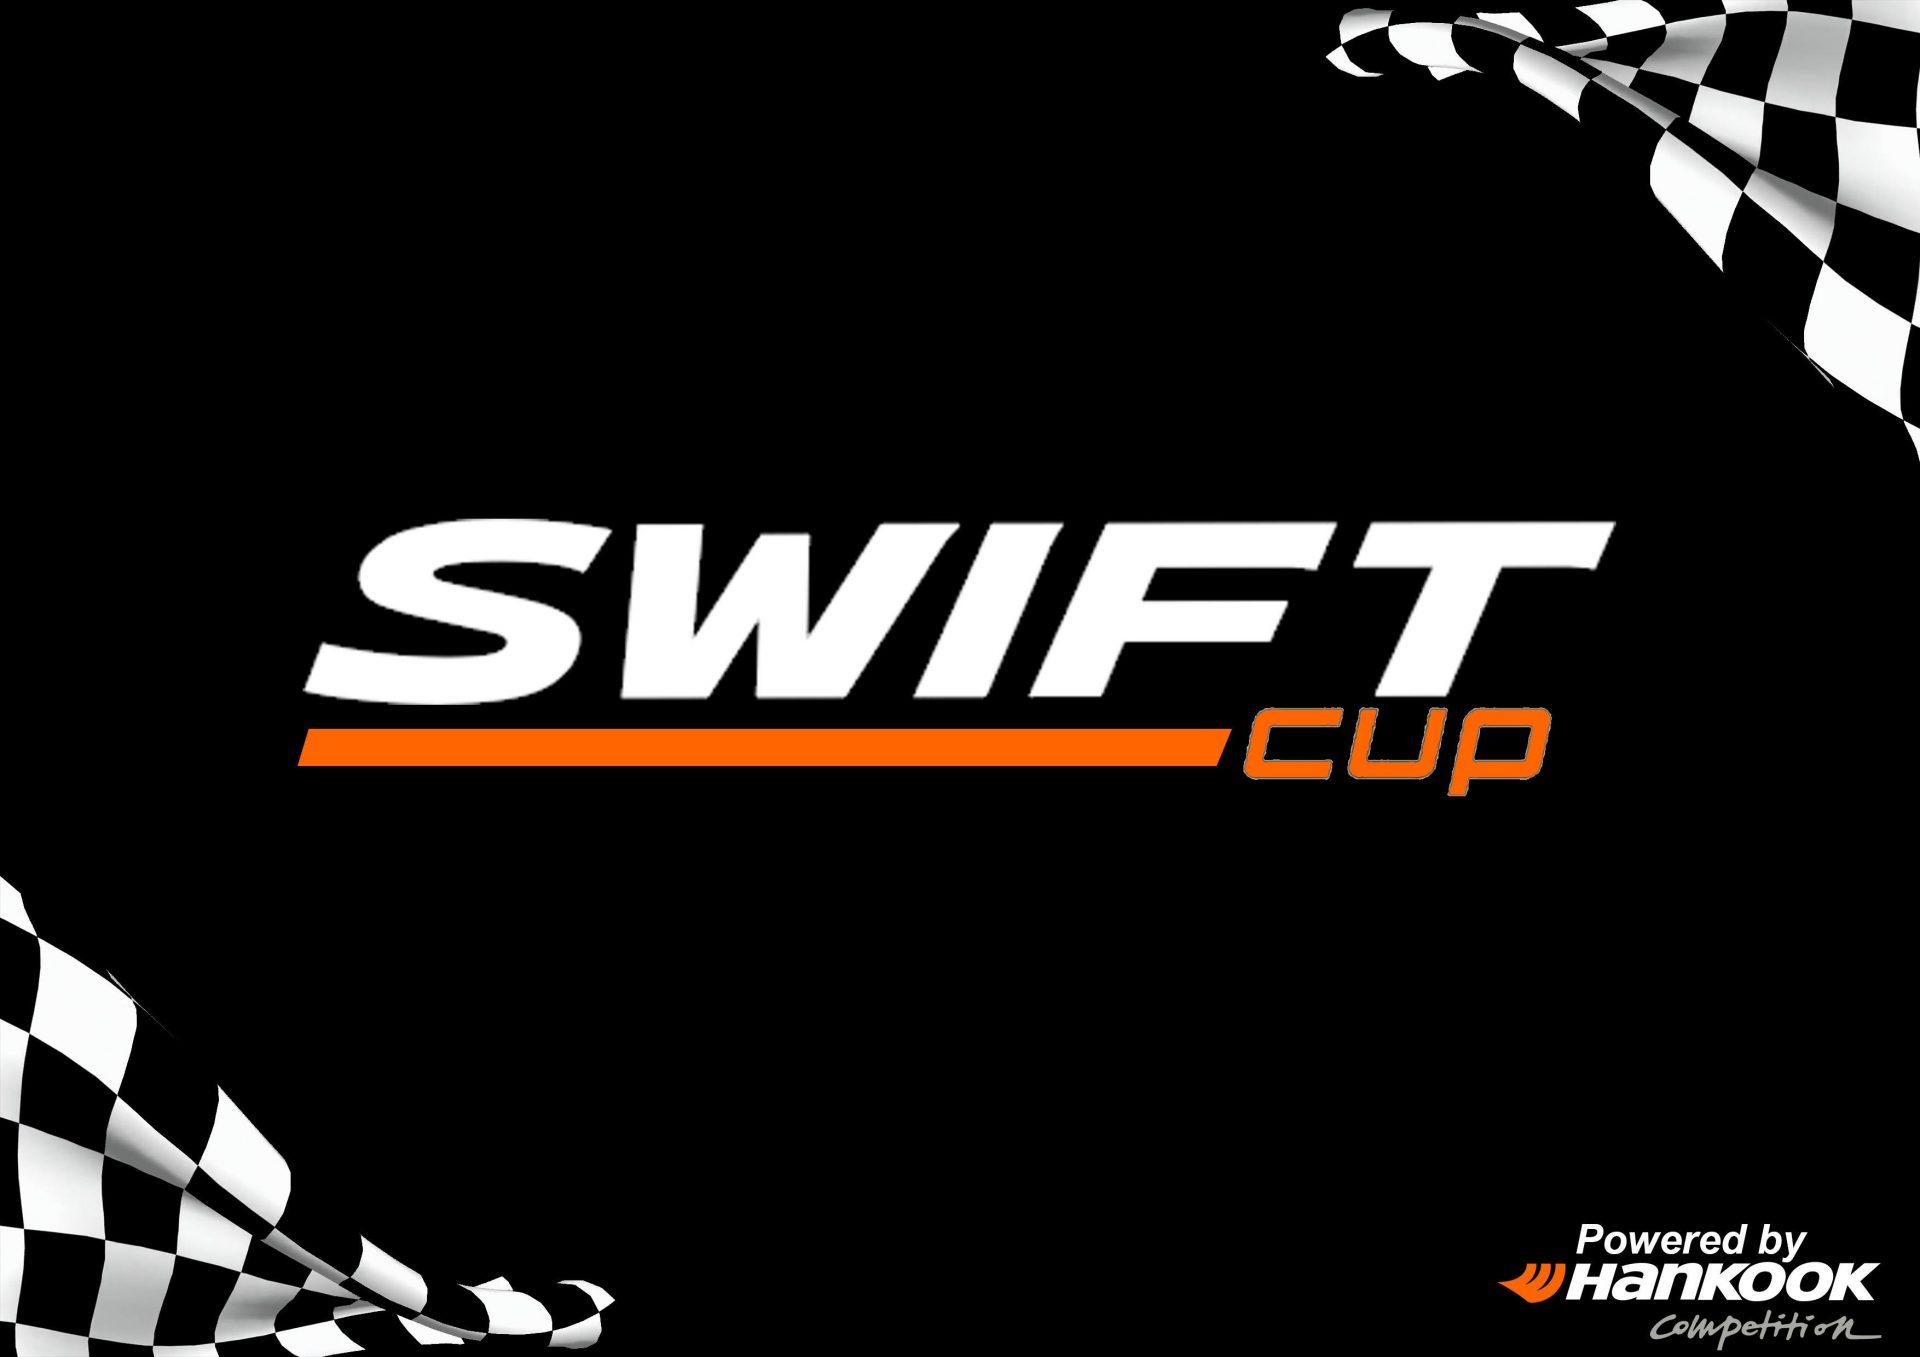 Cupa Suzuki devine Swift Cup în 2020